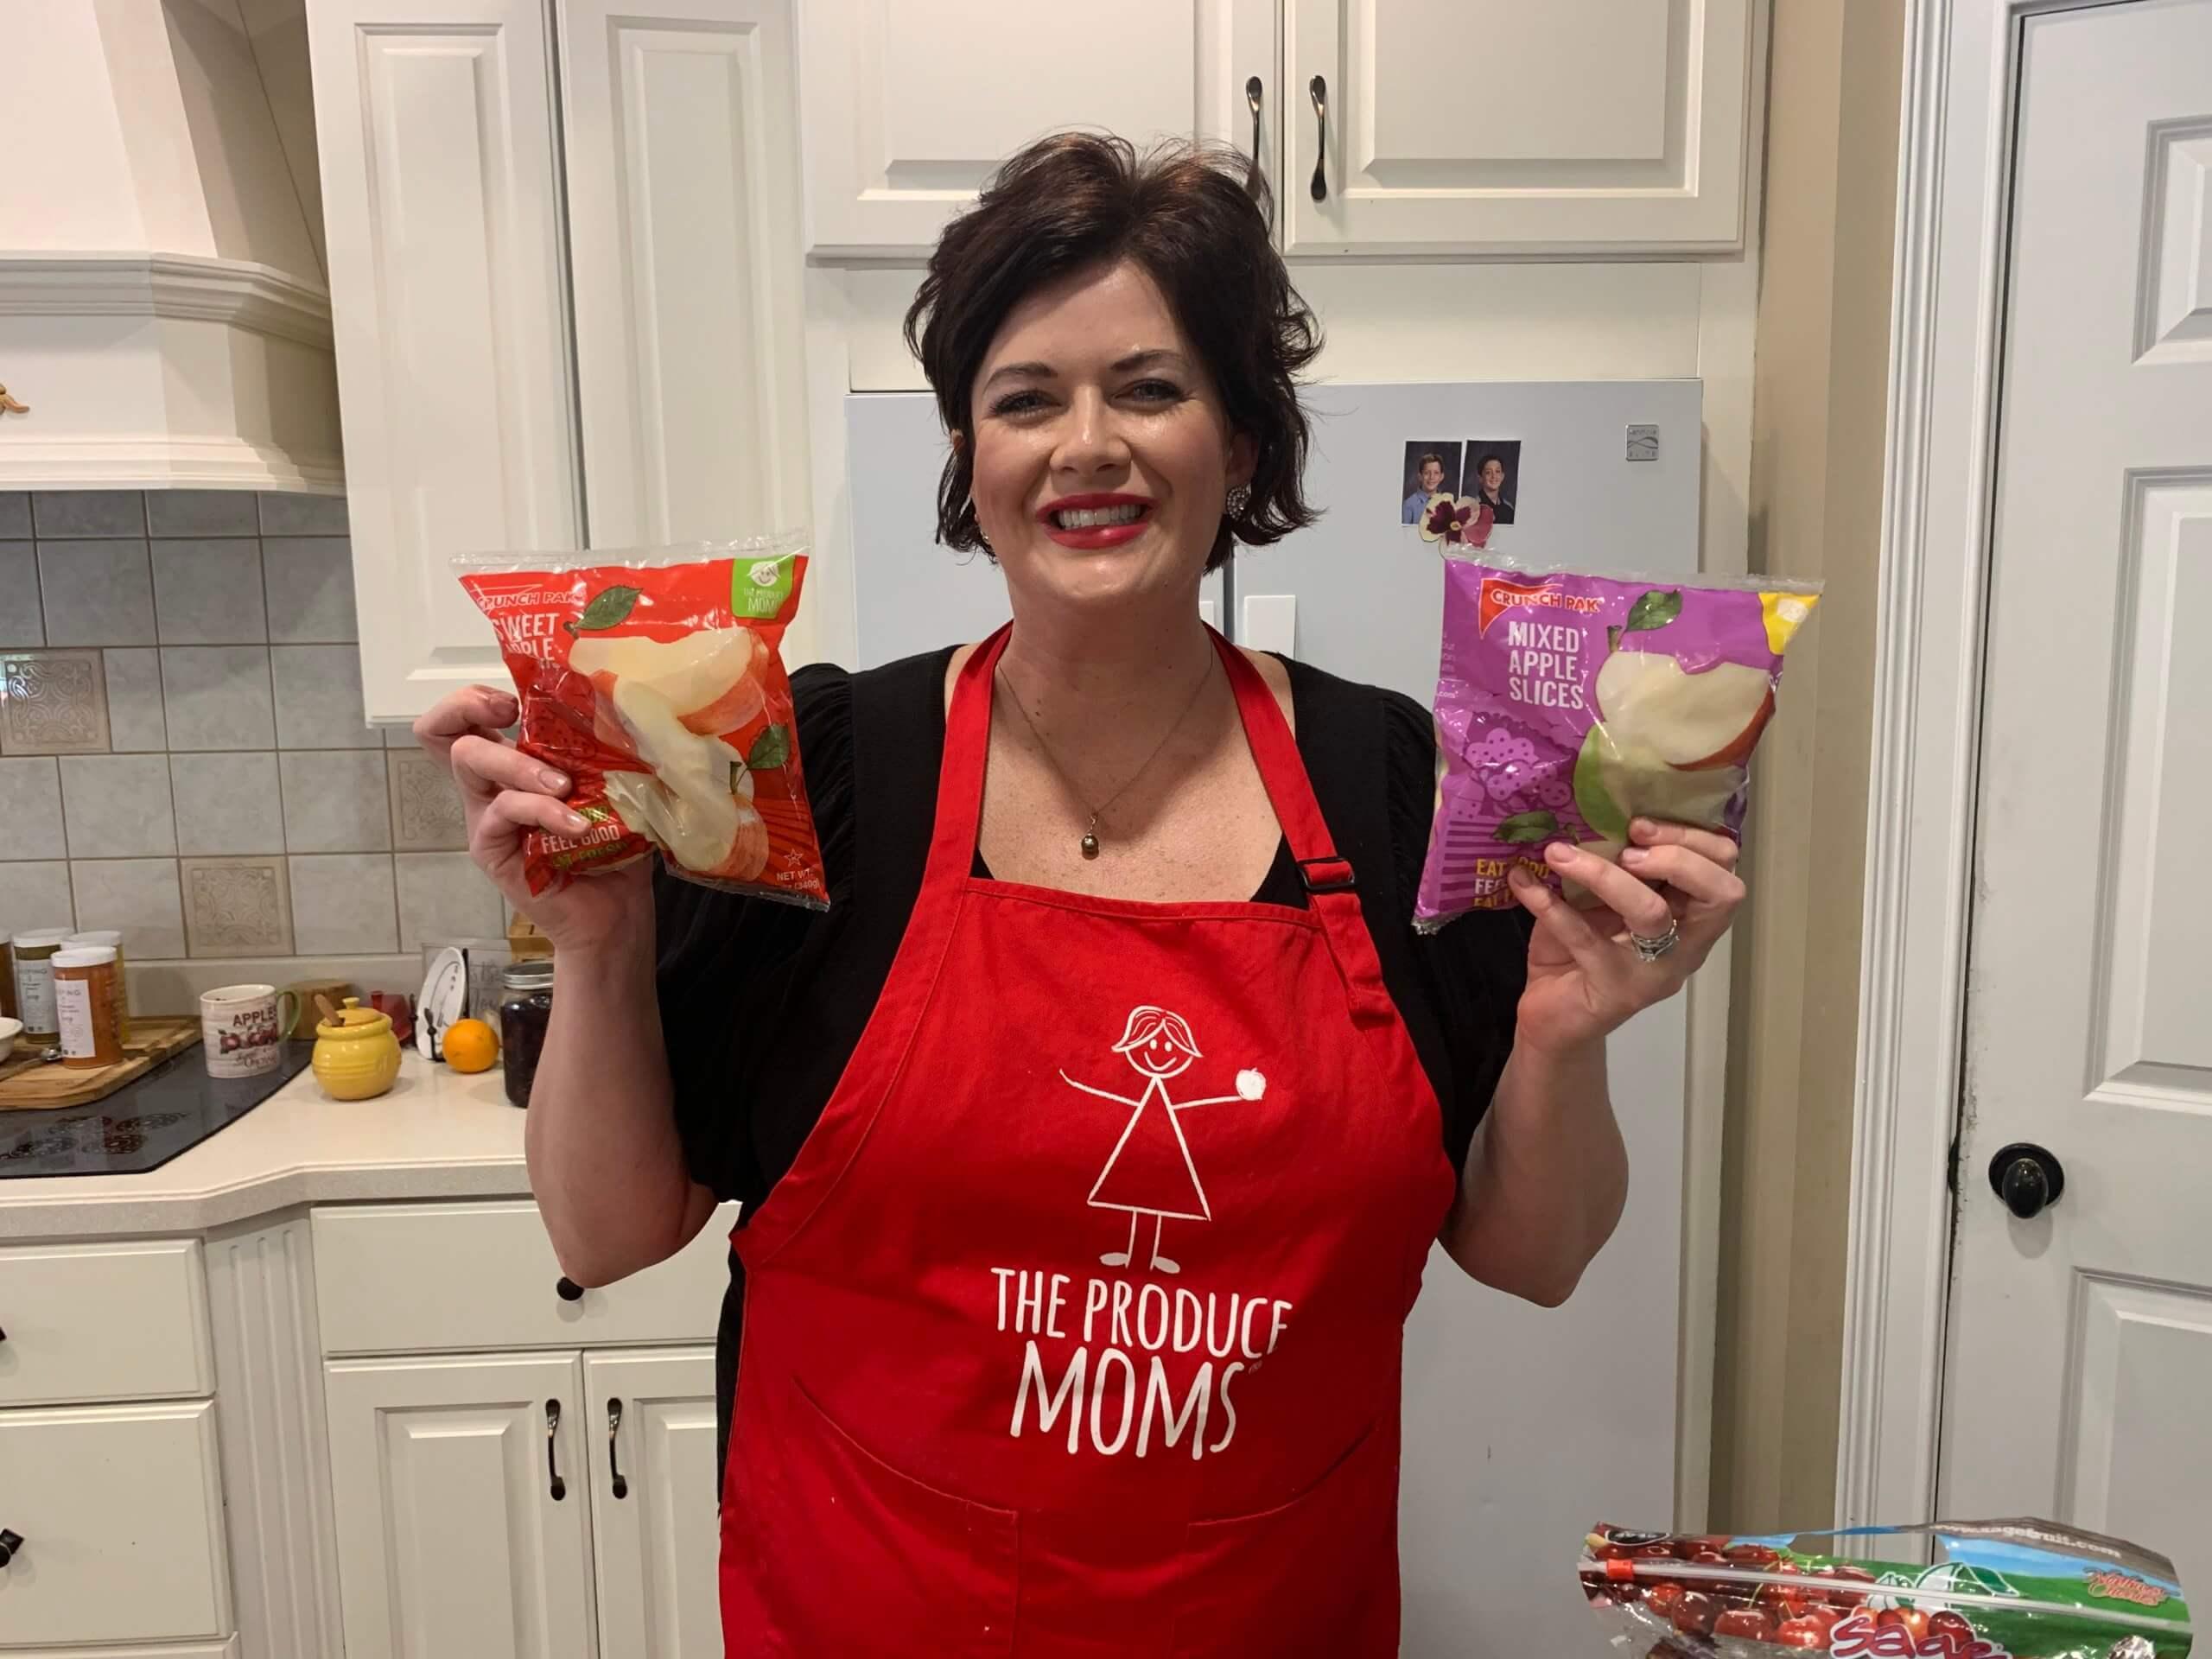 The Produce Moms Crunch Pak® Apple Slices